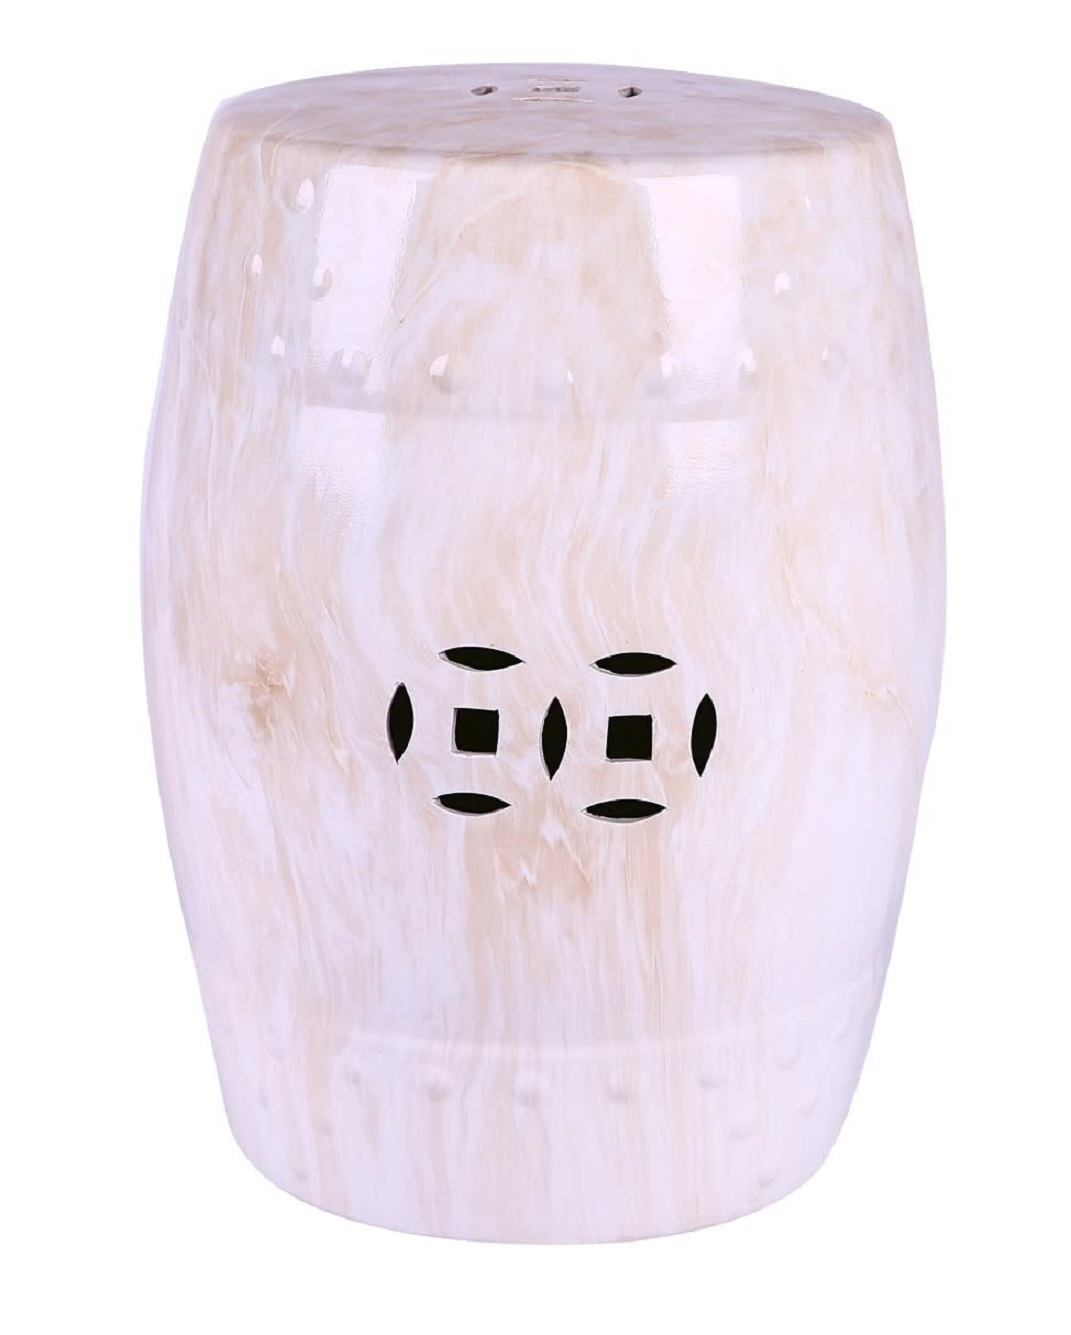 Ceramic Garden Stool Marble Porcelain B33xh45cm Orientique Asianliving